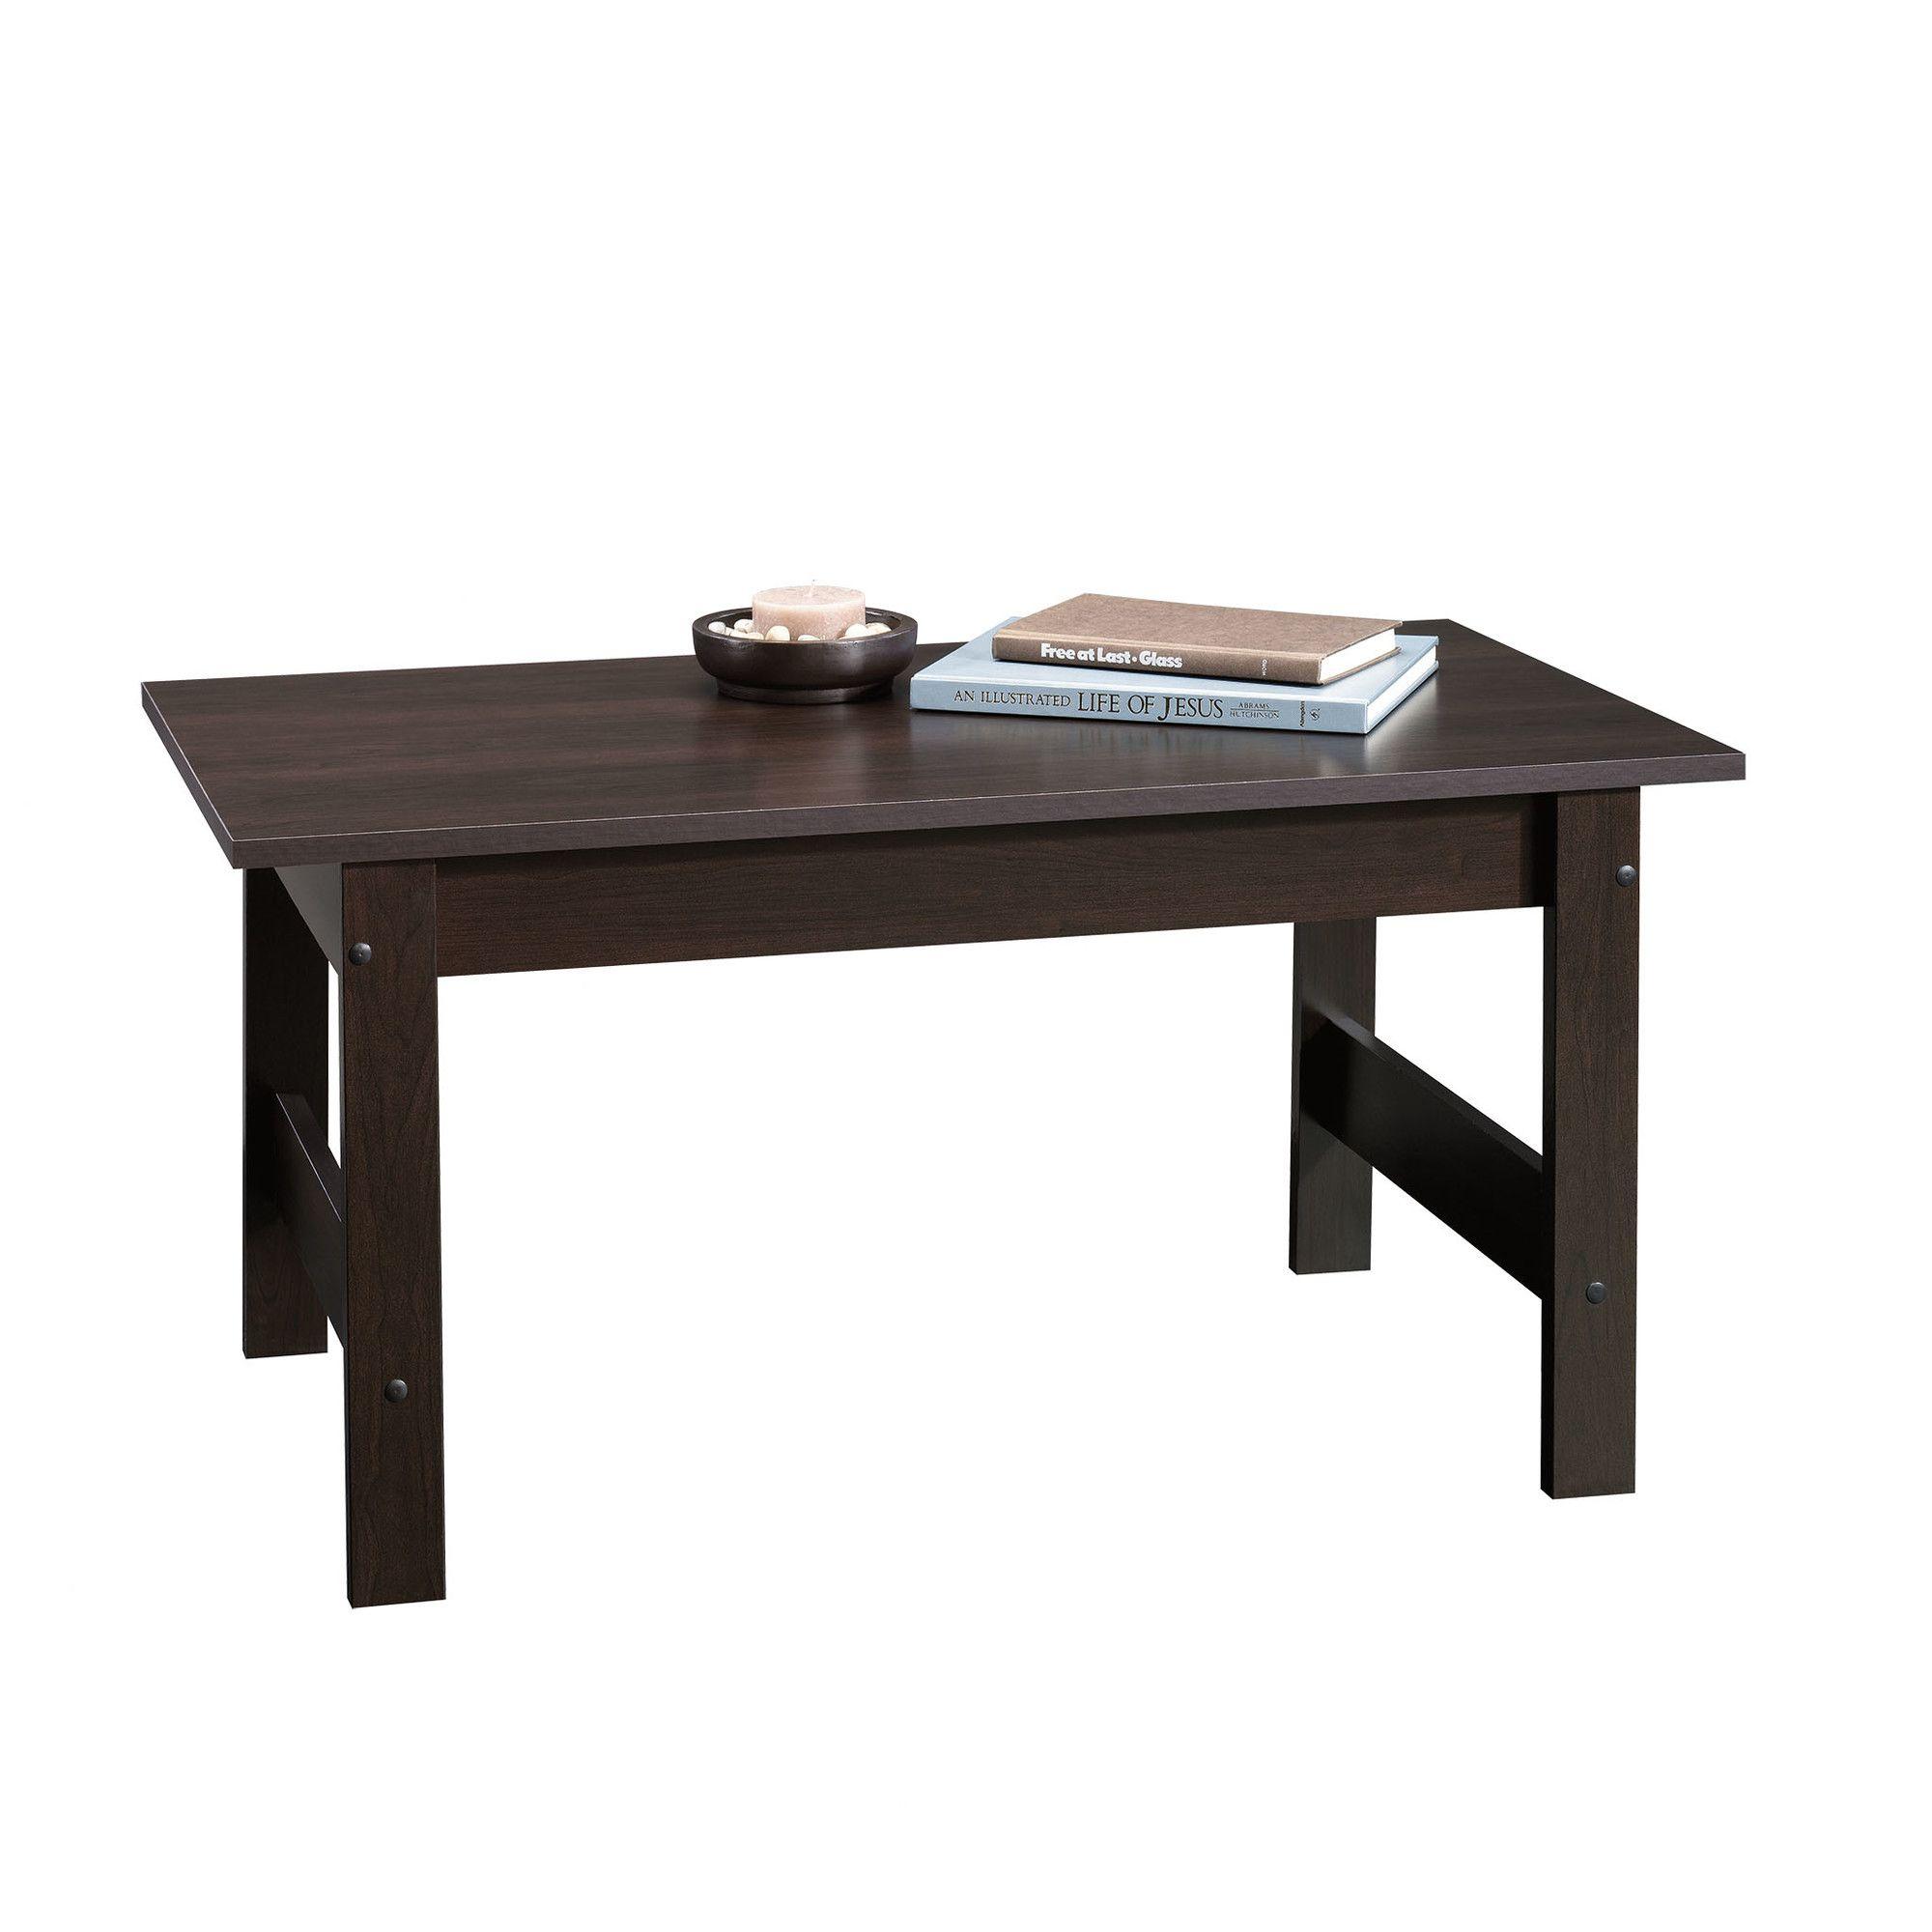 Sauder Beginnings Coffee Table Wayfair Coffee table